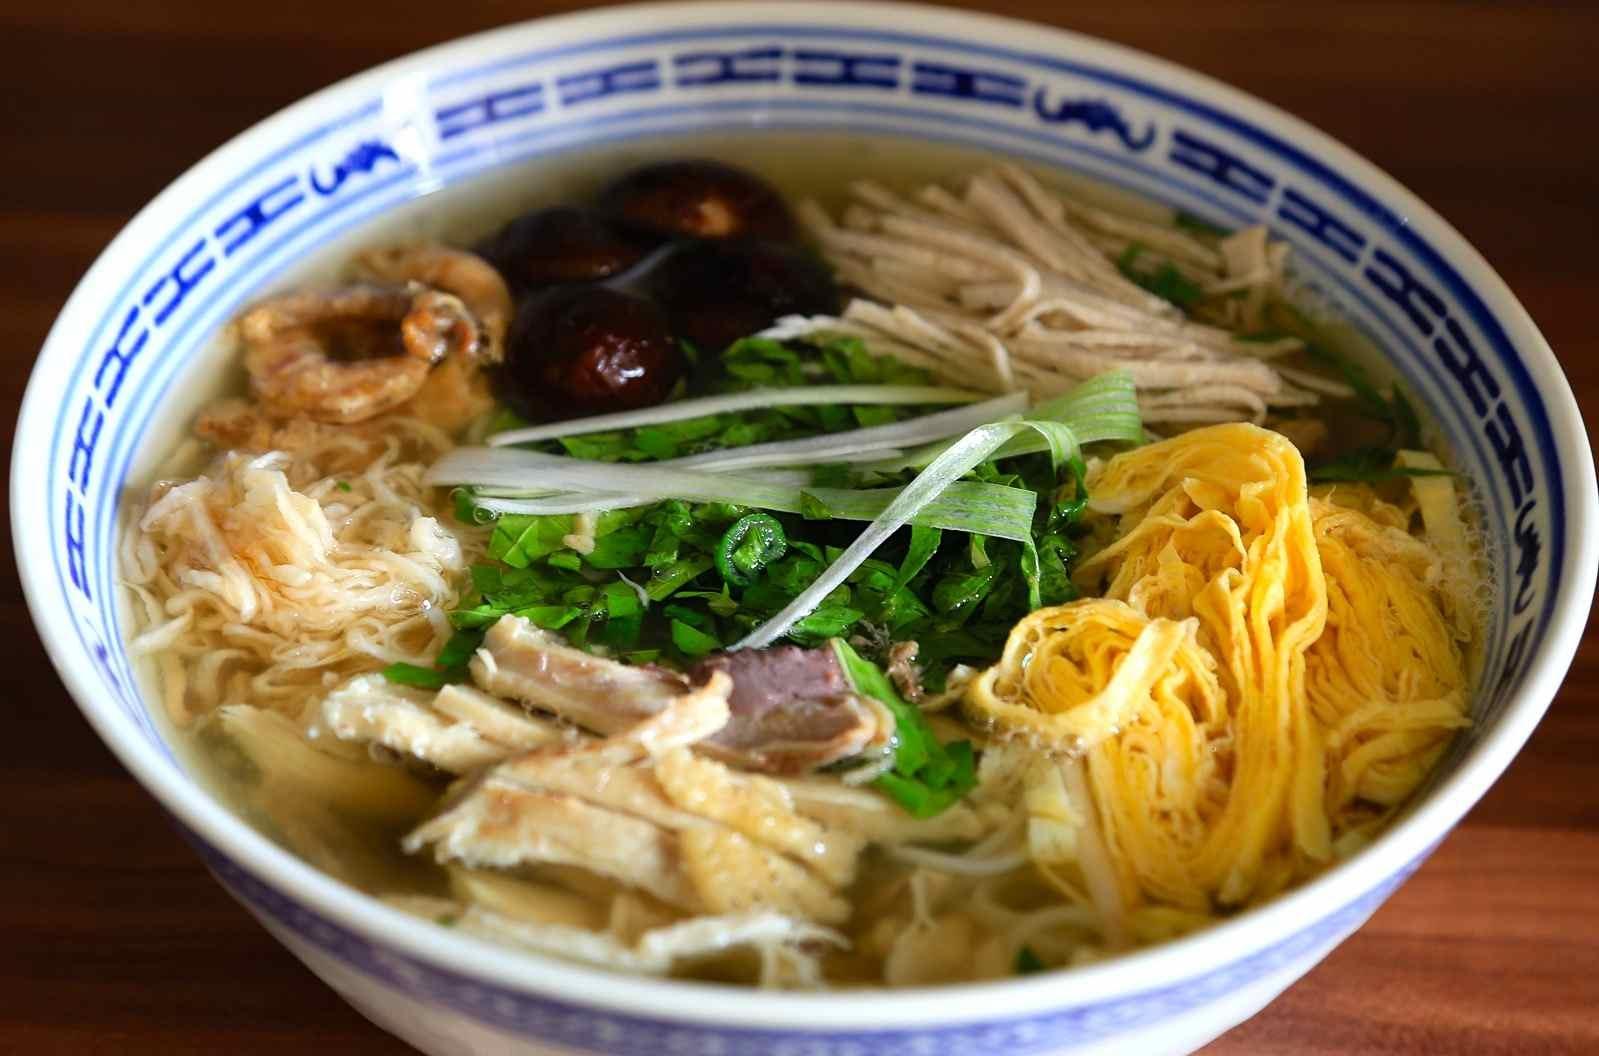 hanoi_mon-an-ngon-ha-noi-03